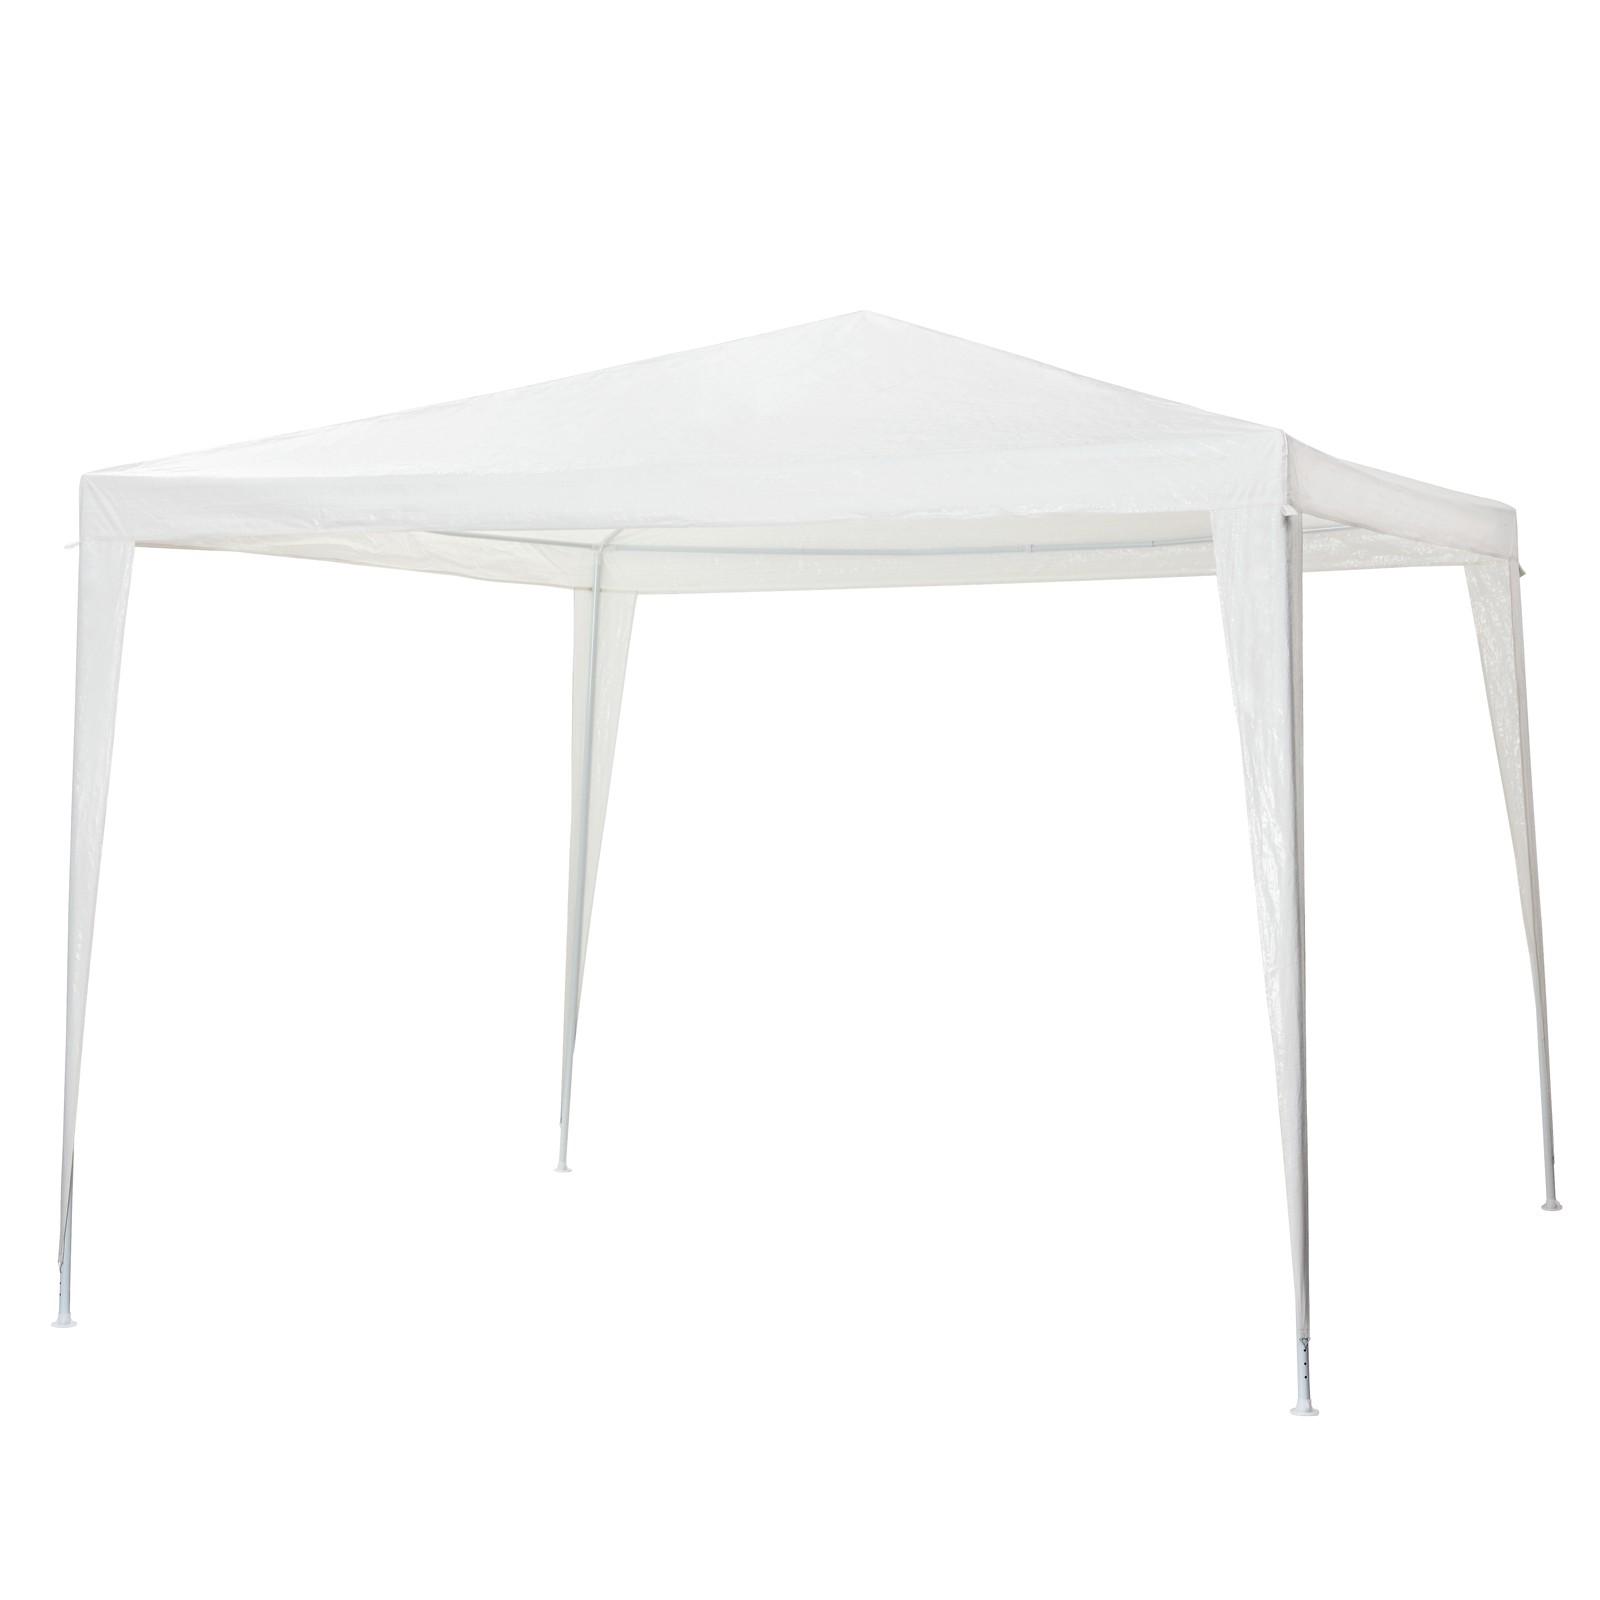 tepro pavillon gartenpavillon mana faltpavillon gartenzelt wasserabweisend ebay. Black Bedroom Furniture Sets. Home Design Ideas